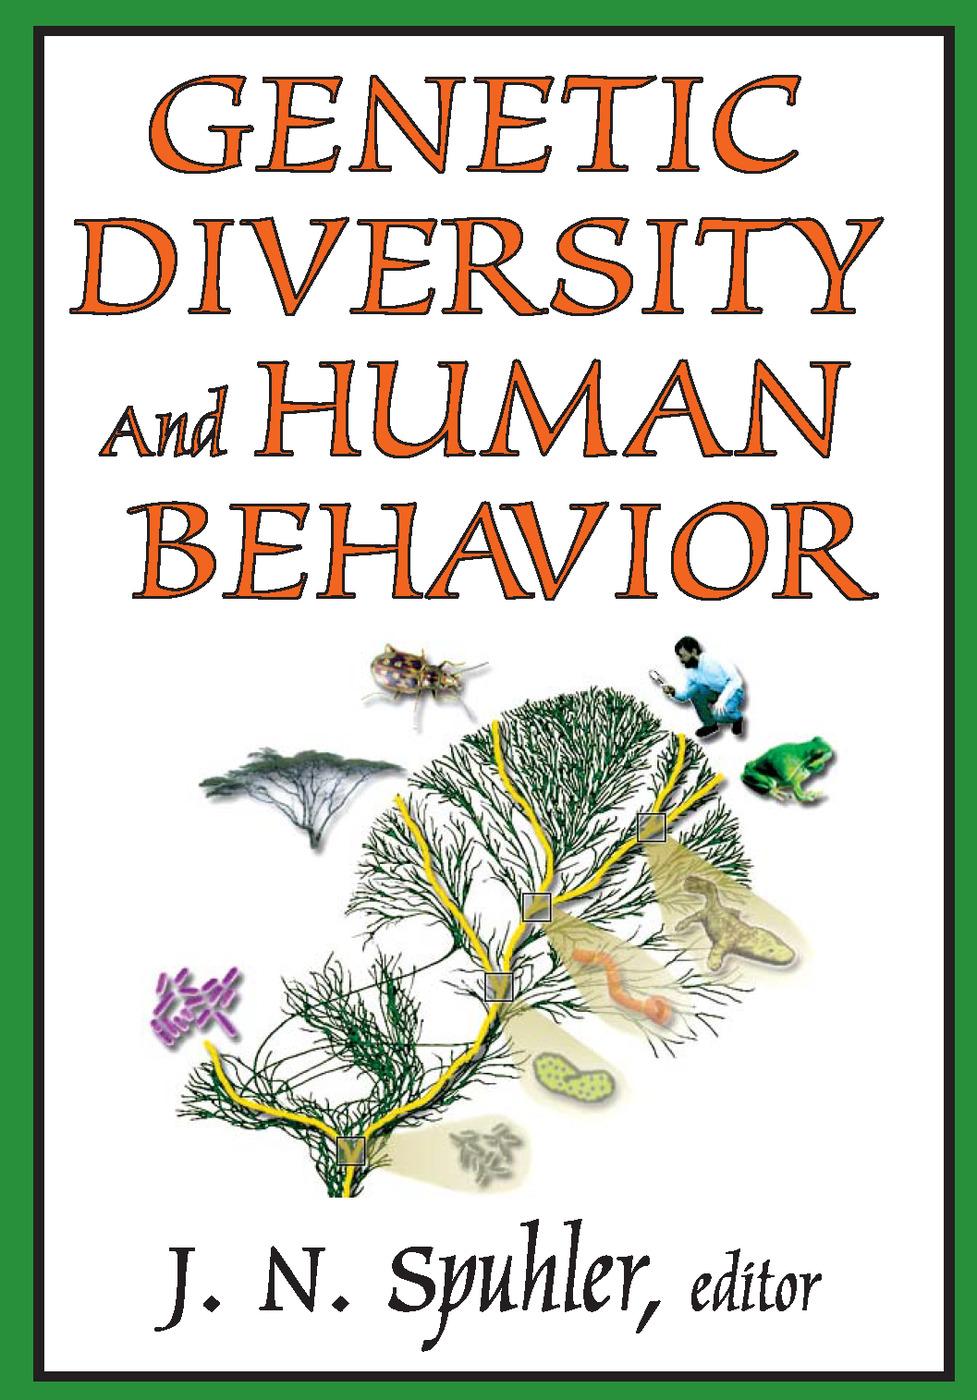 Genetic Diversity and Human Behavior